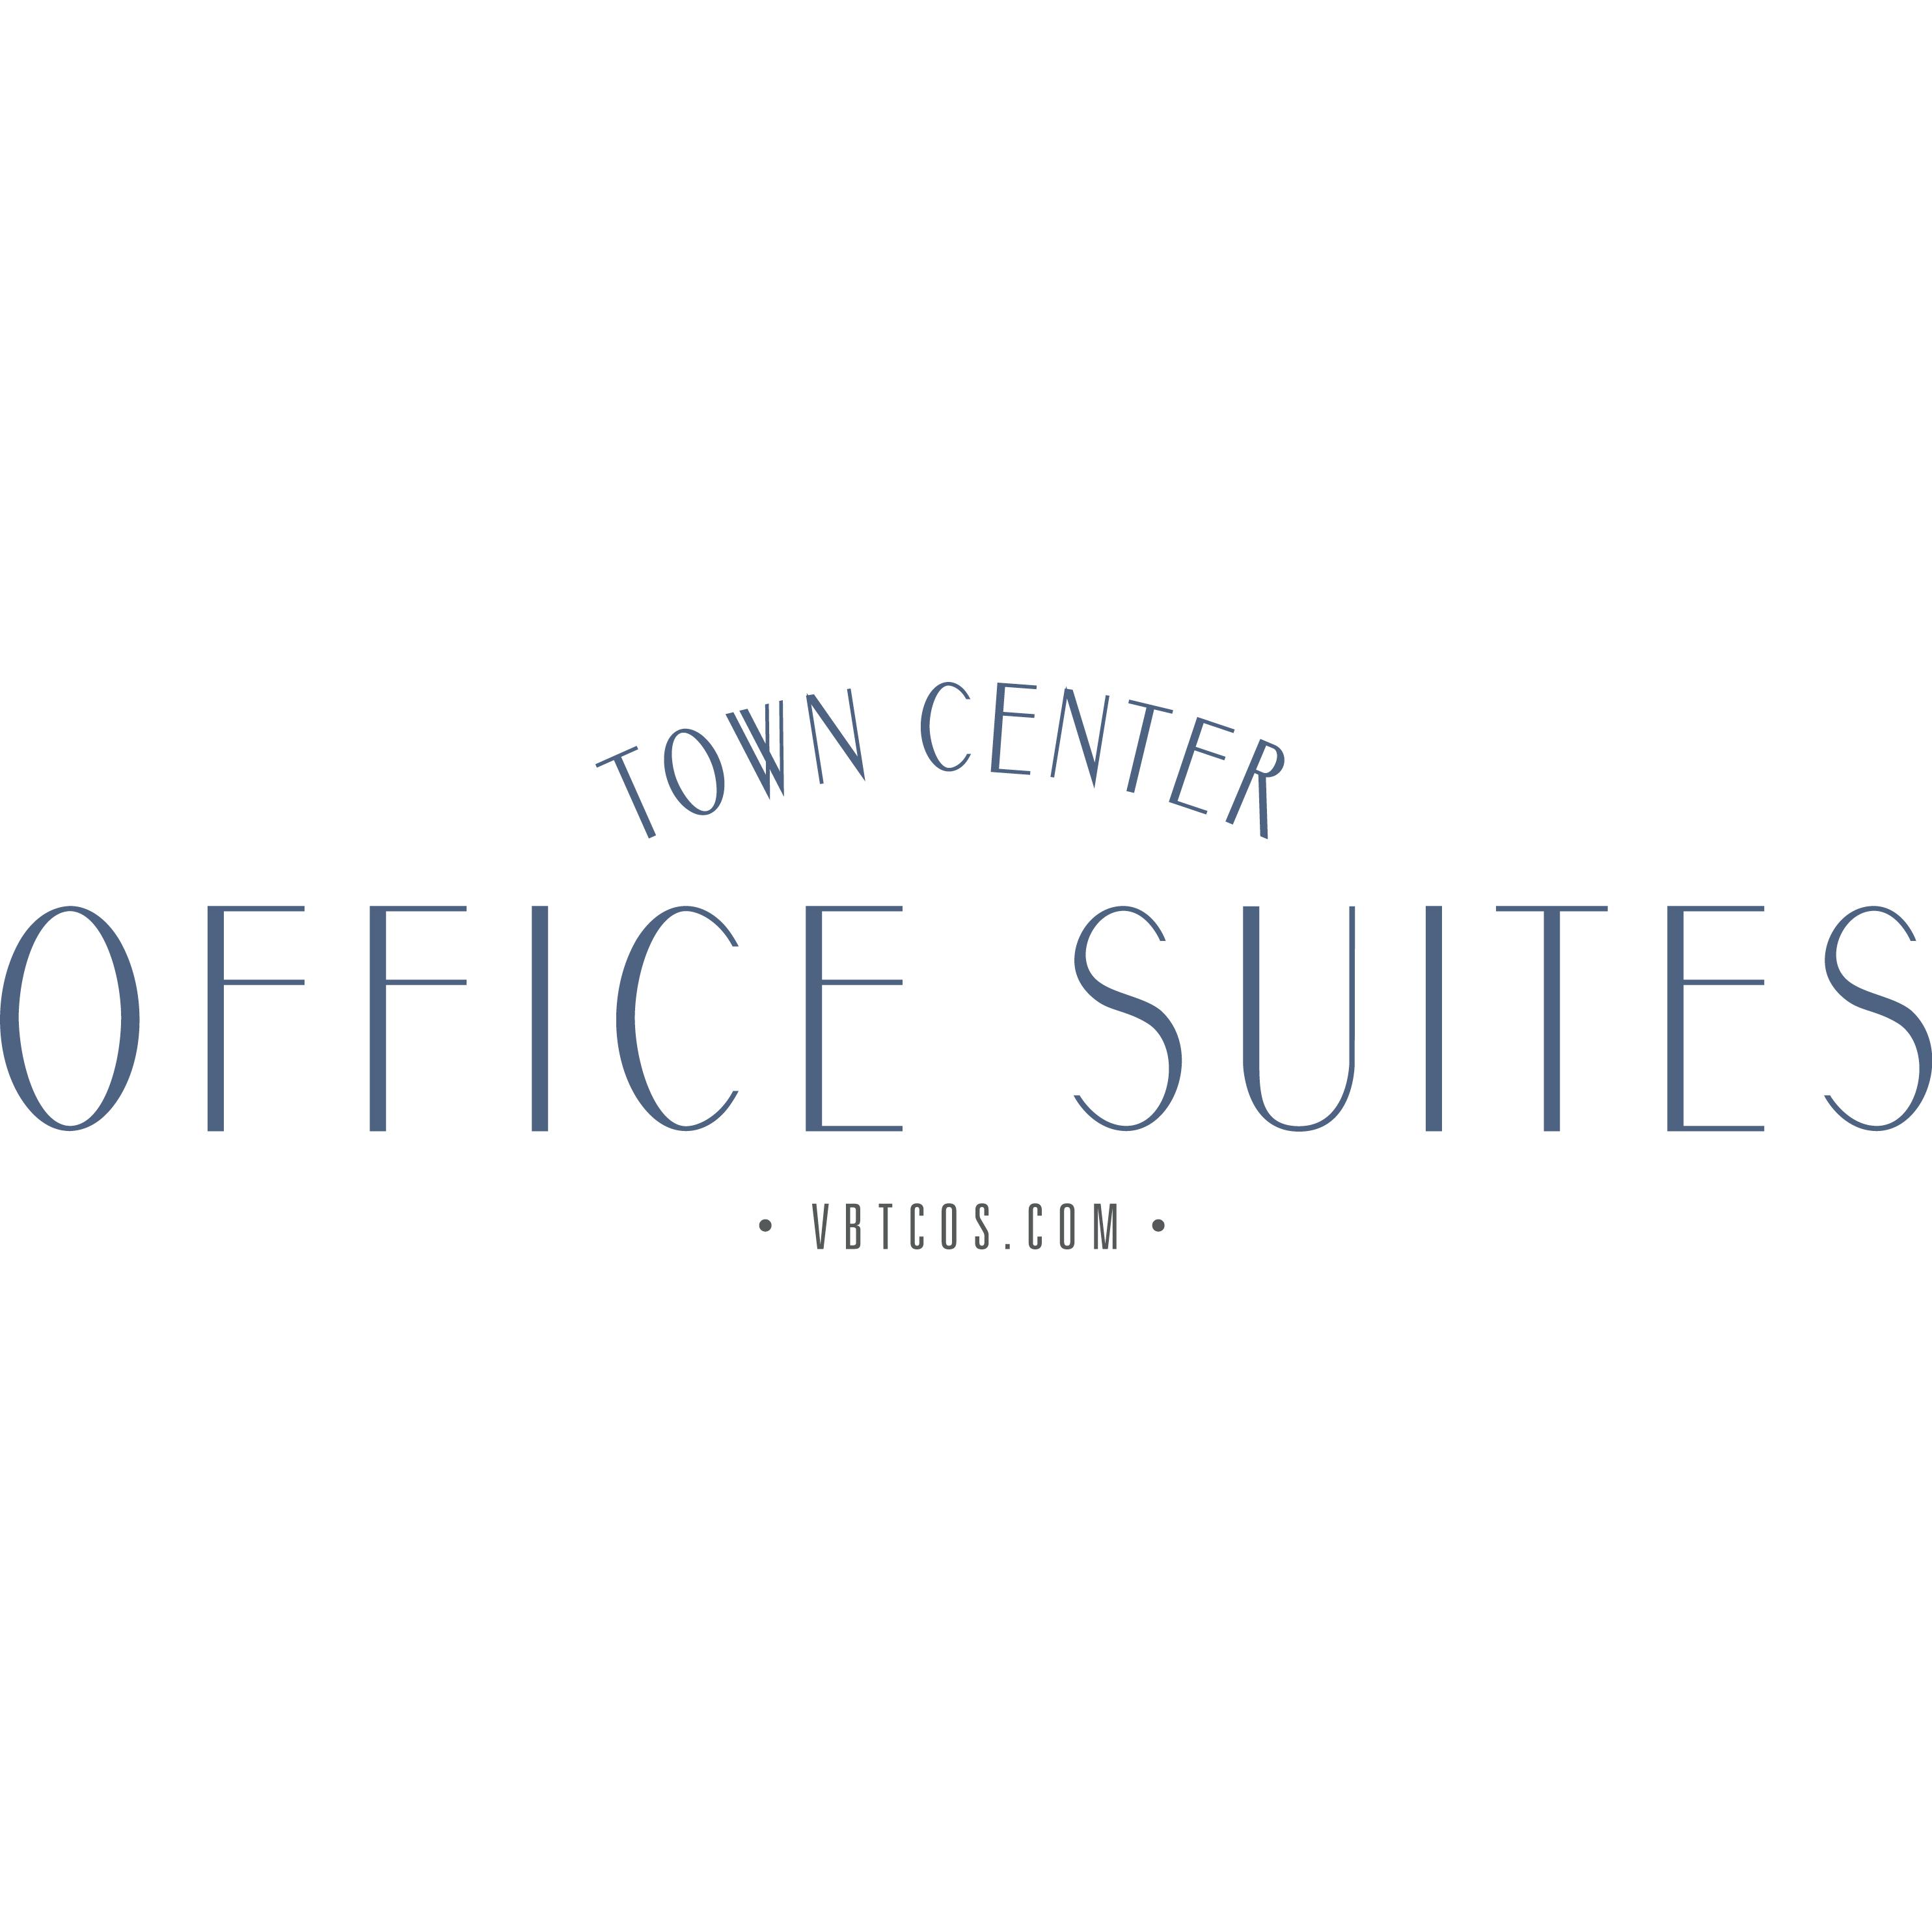 Town Center Office Suites